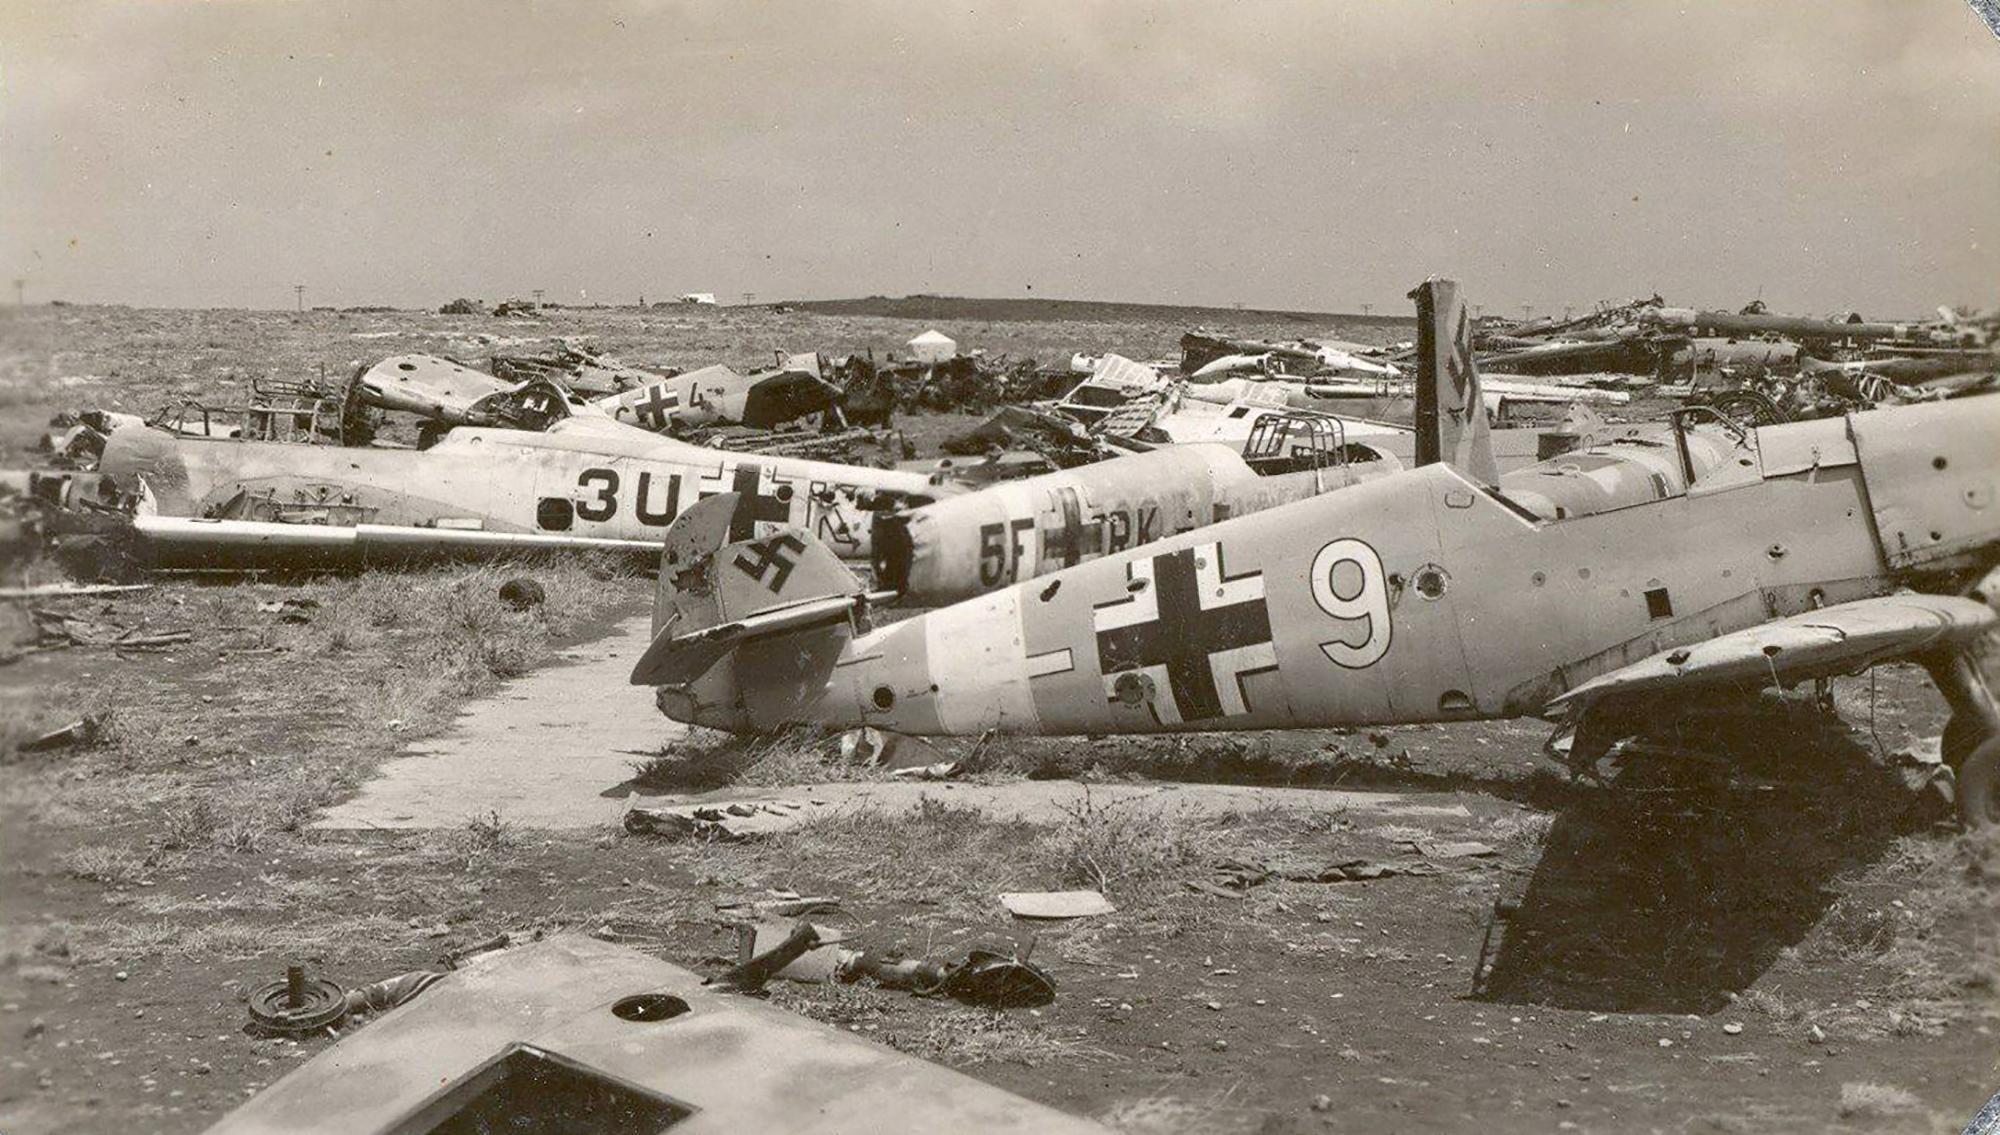 Messerschmitt Bf 109F4Trop 4.JG27 White 9 abandoned Derna Libya 1942 Nov 1942 ebay1